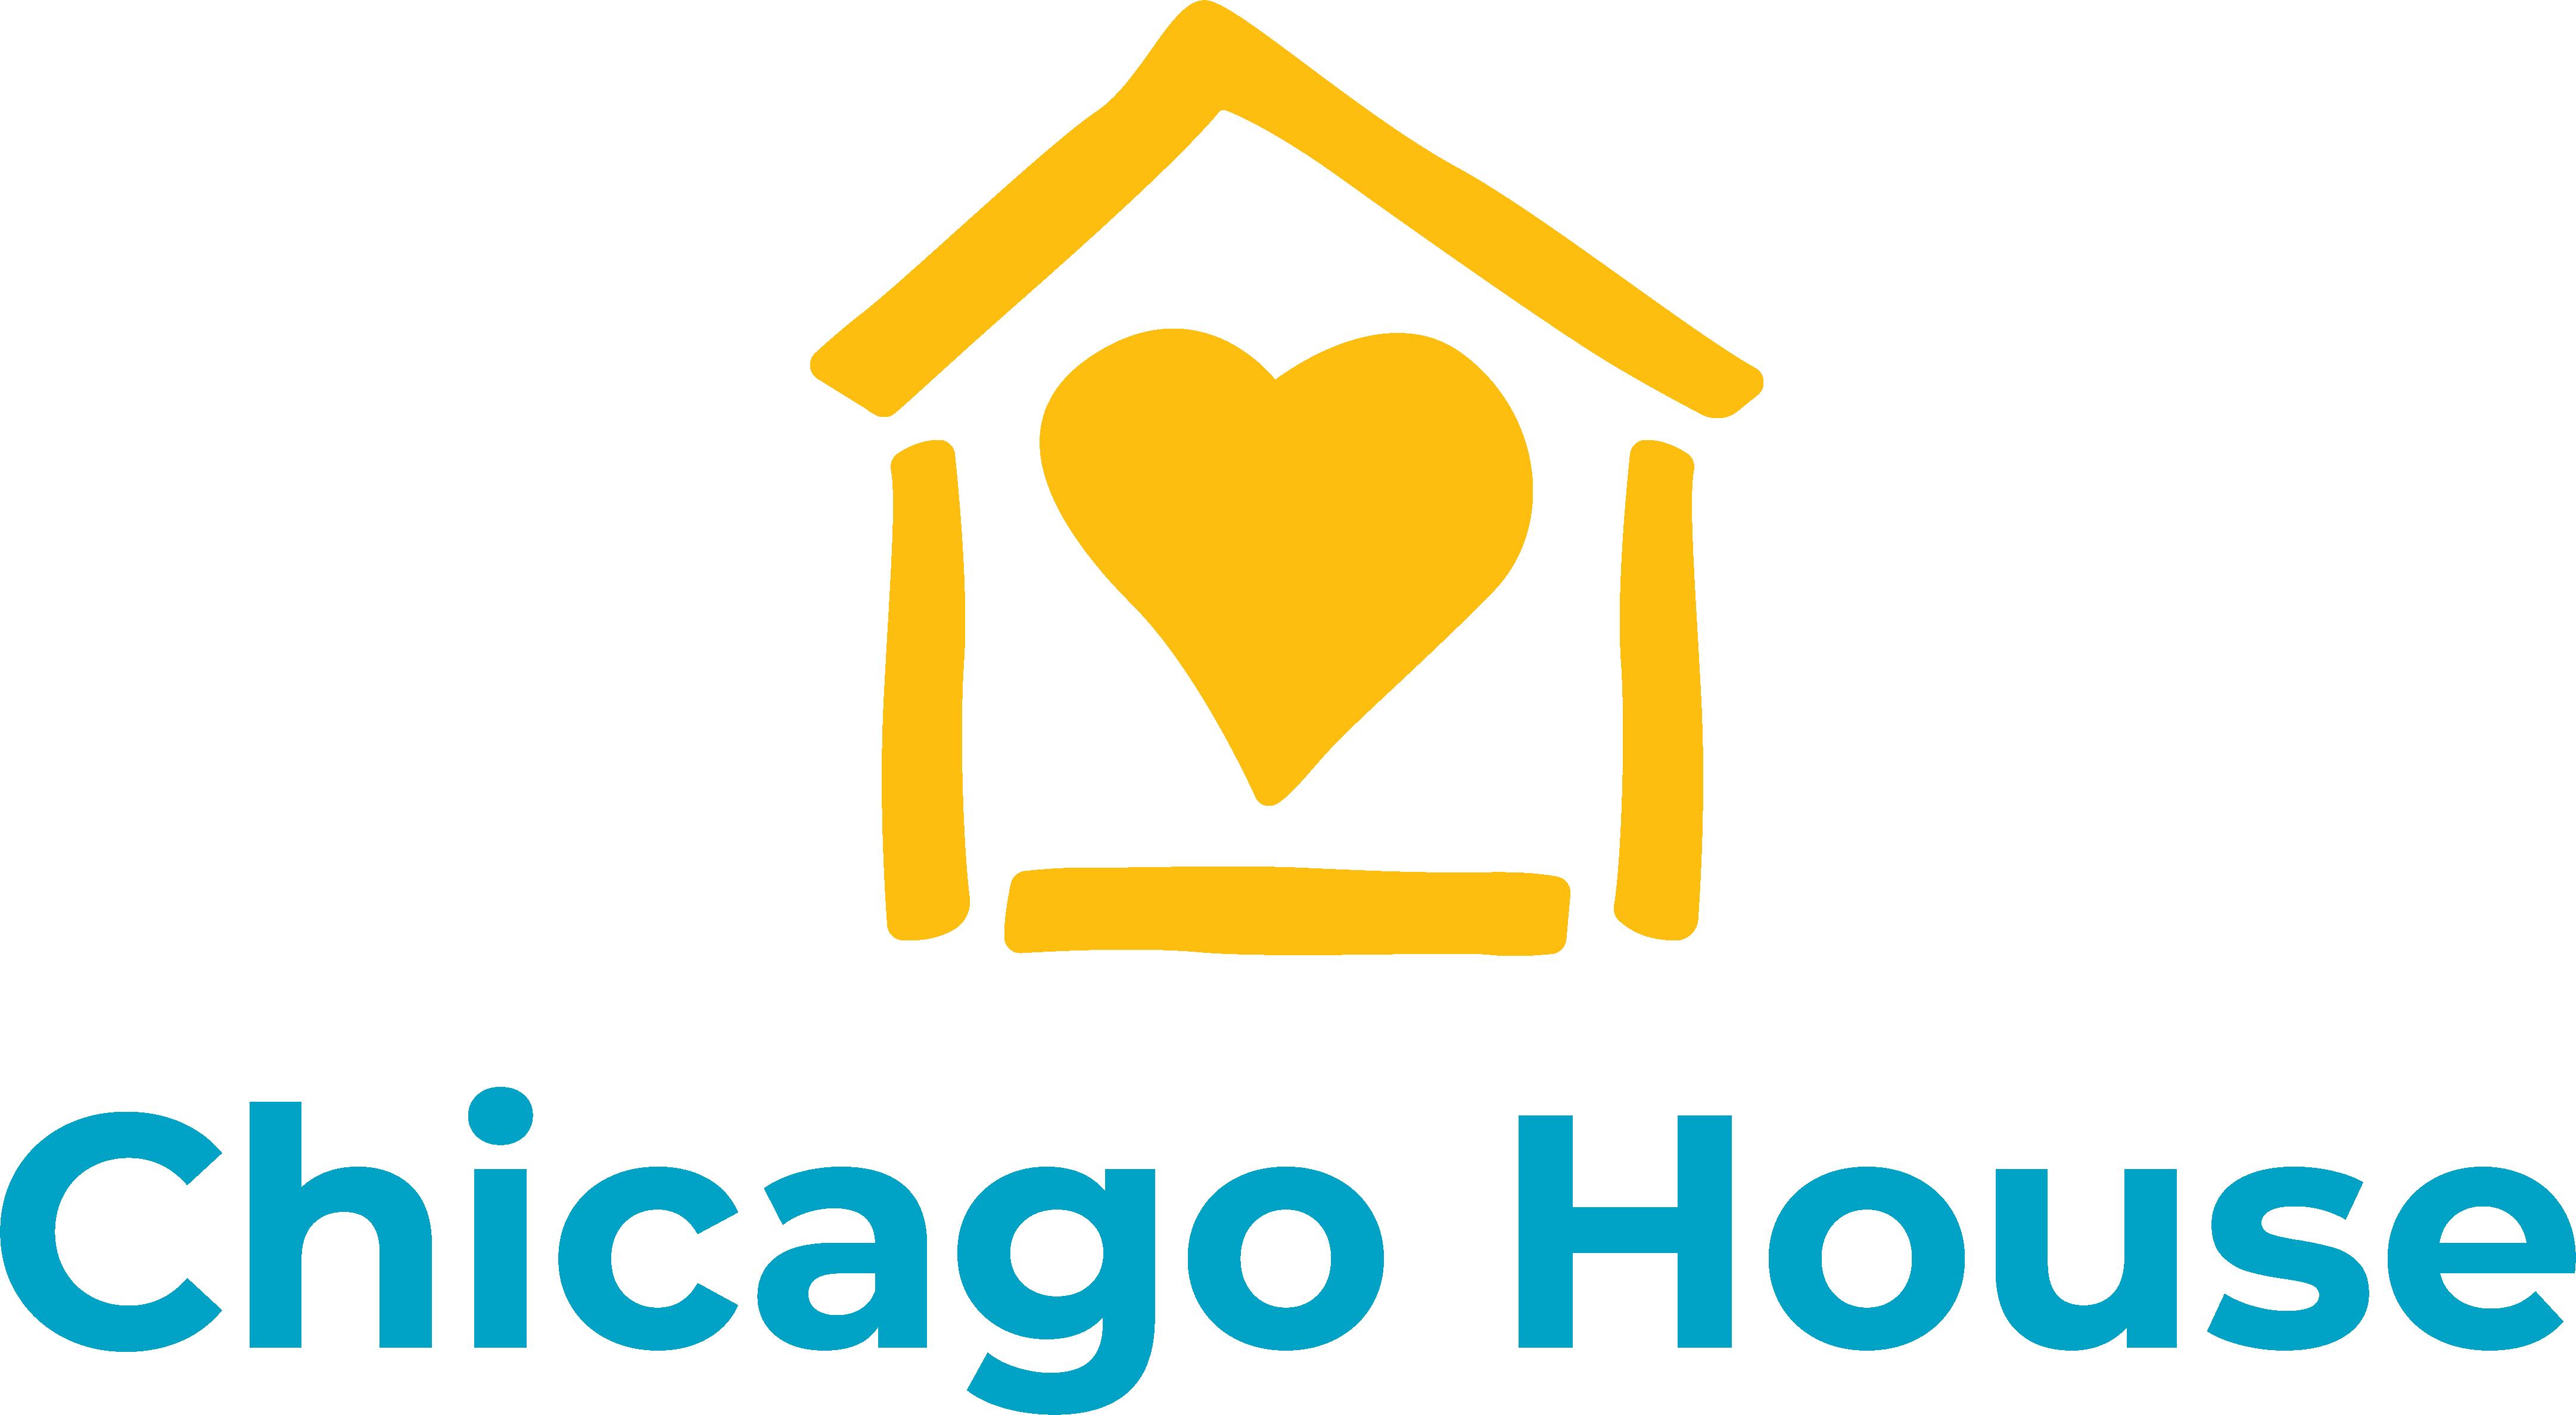 Chicago House's logo